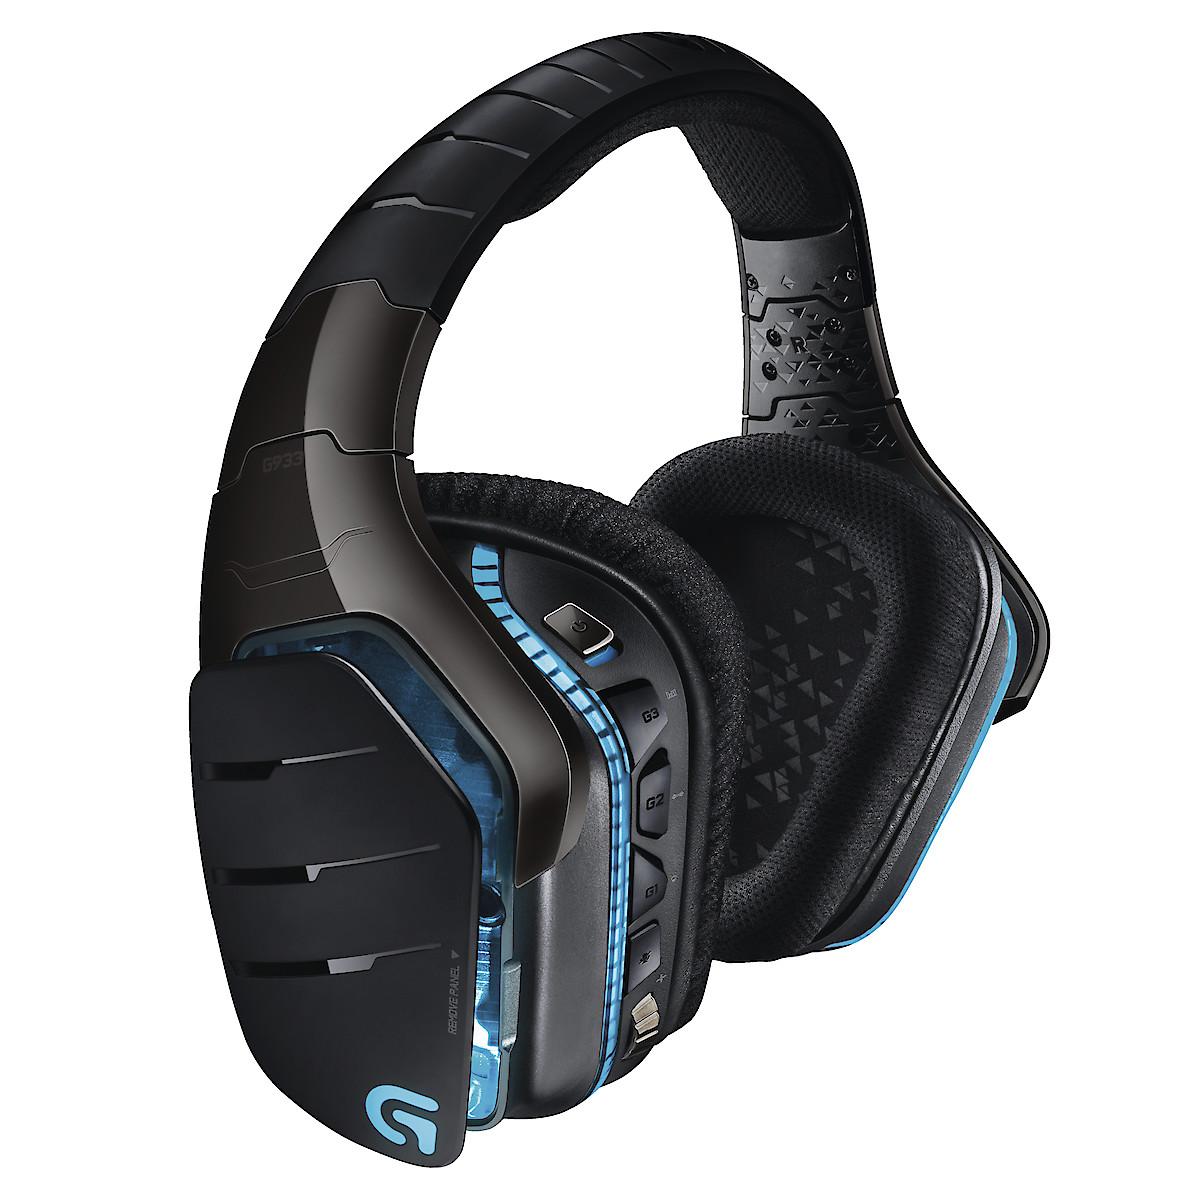 Trådlöst headset gaming USB Logitech G933 Artemis Spectrum